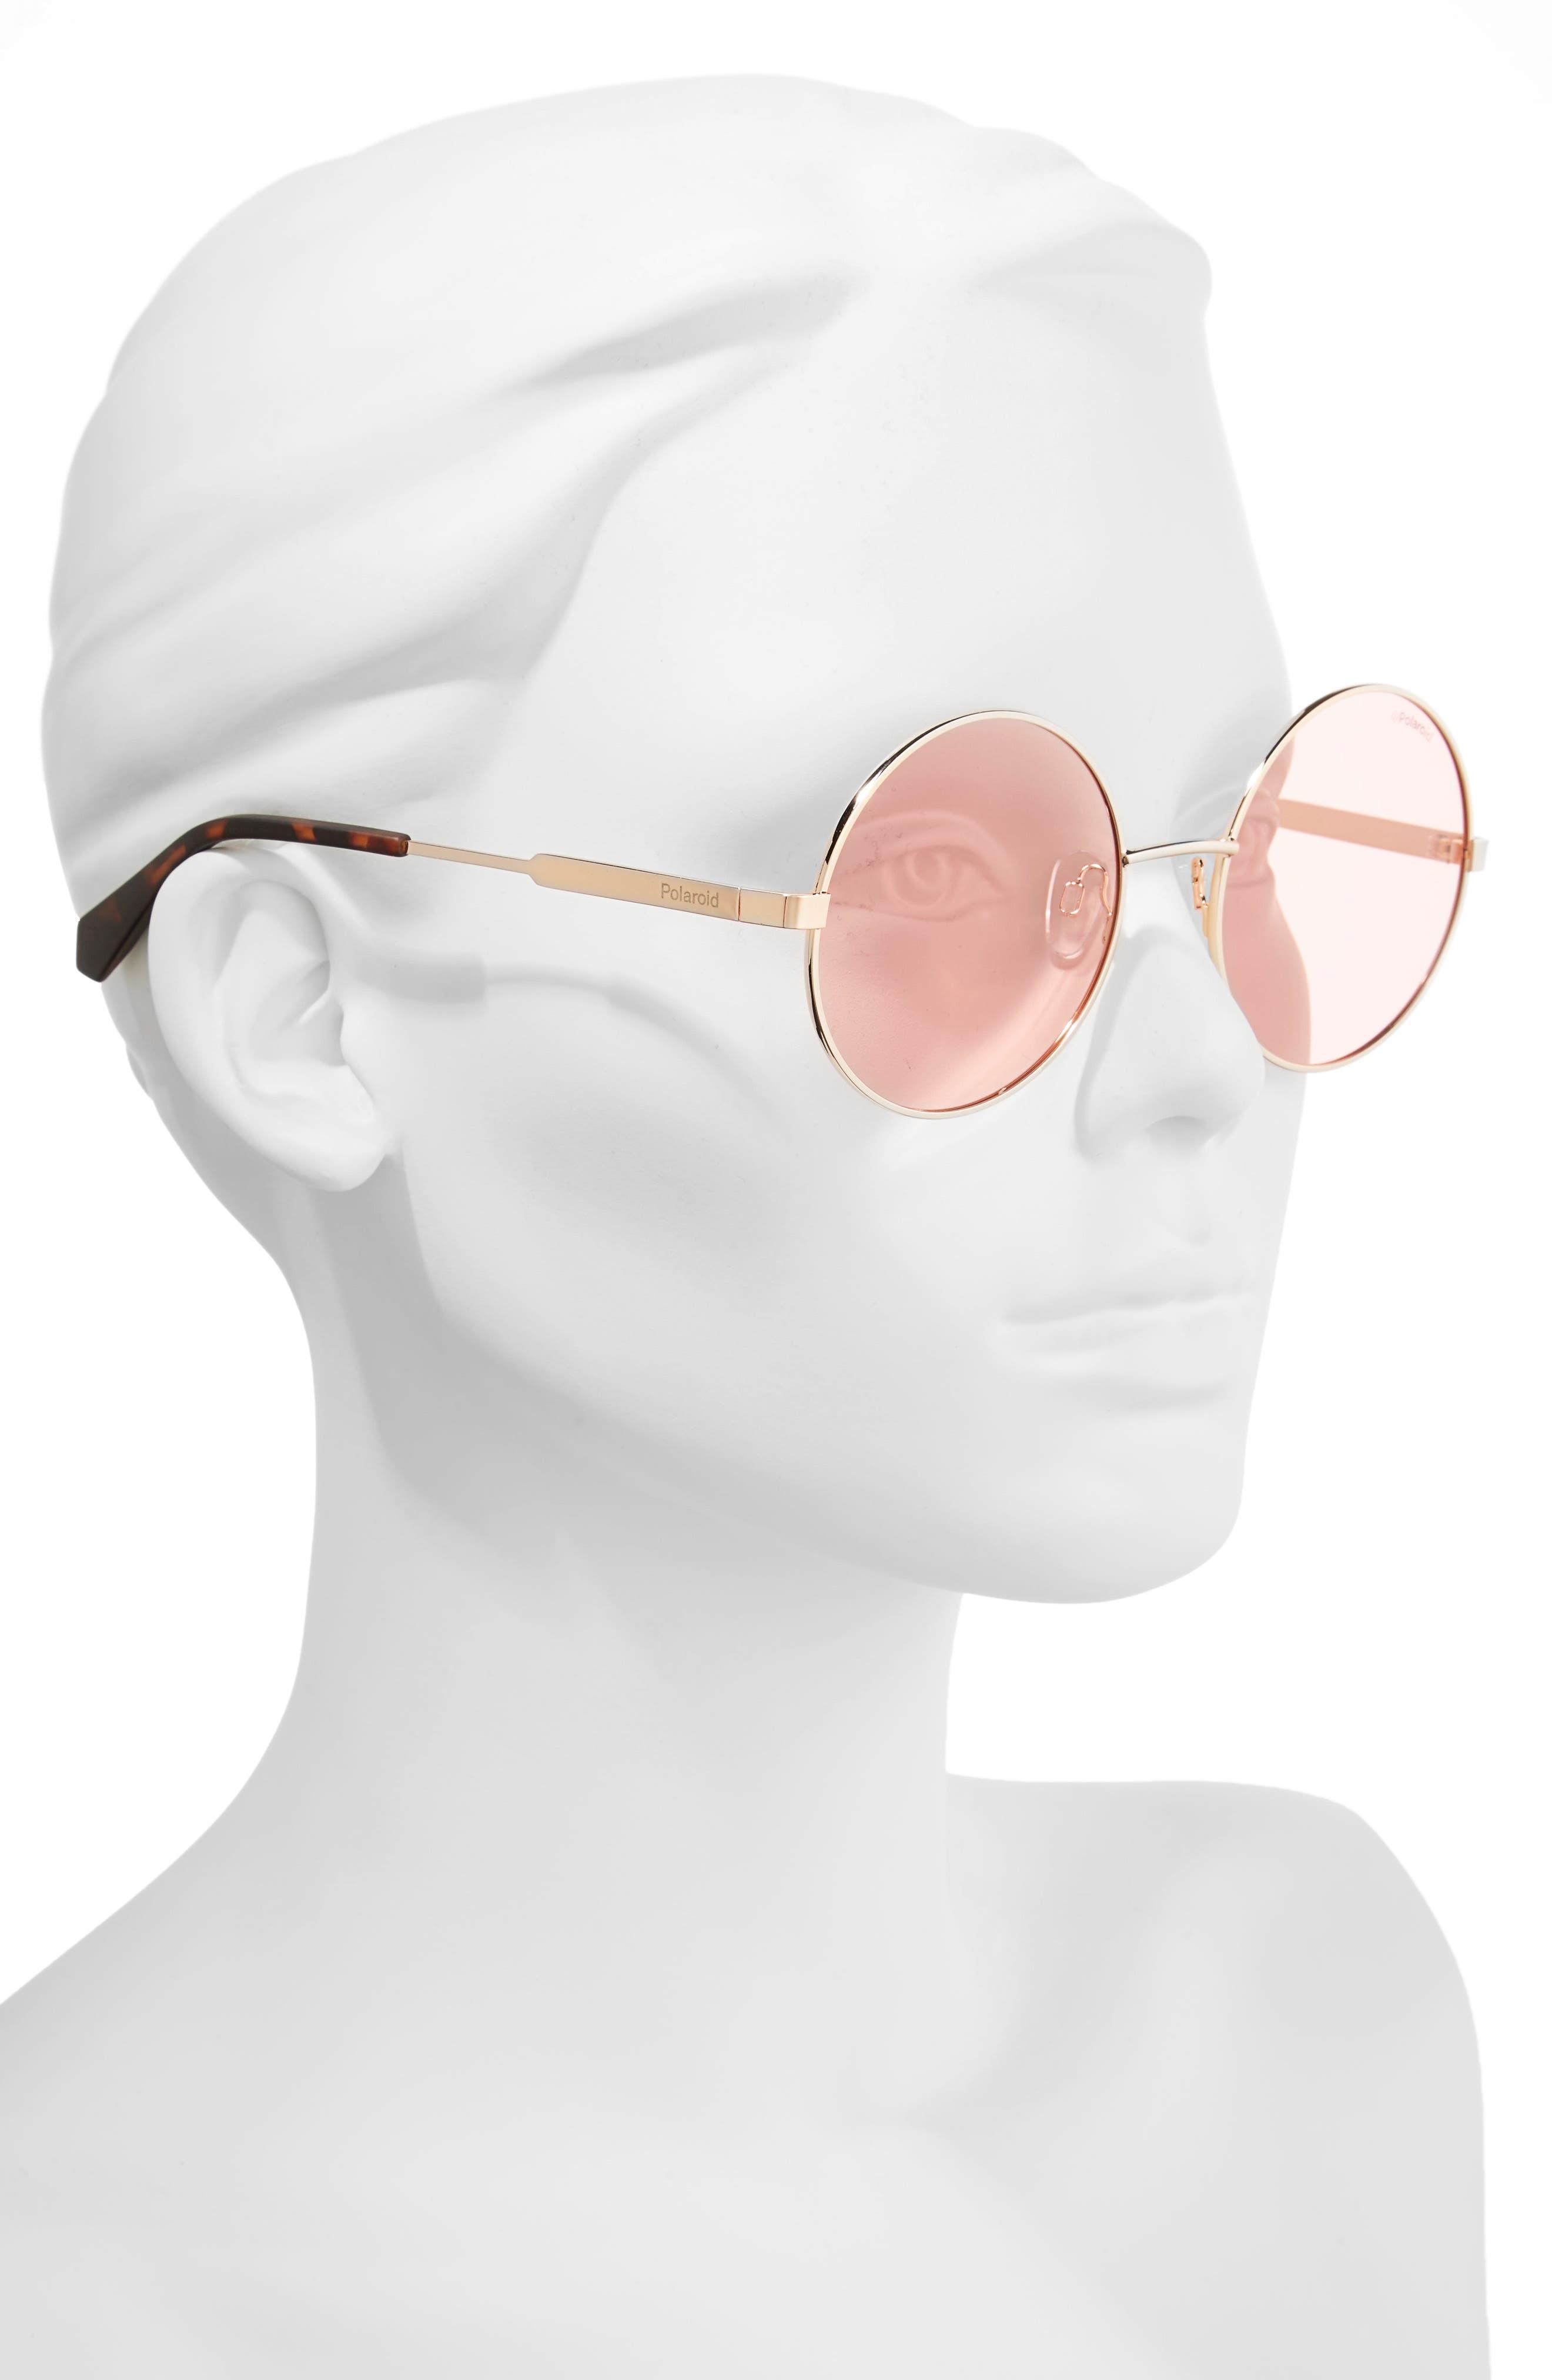 55mm Polarized Round Sunglasses,                             Alternate thumbnail 7, color,